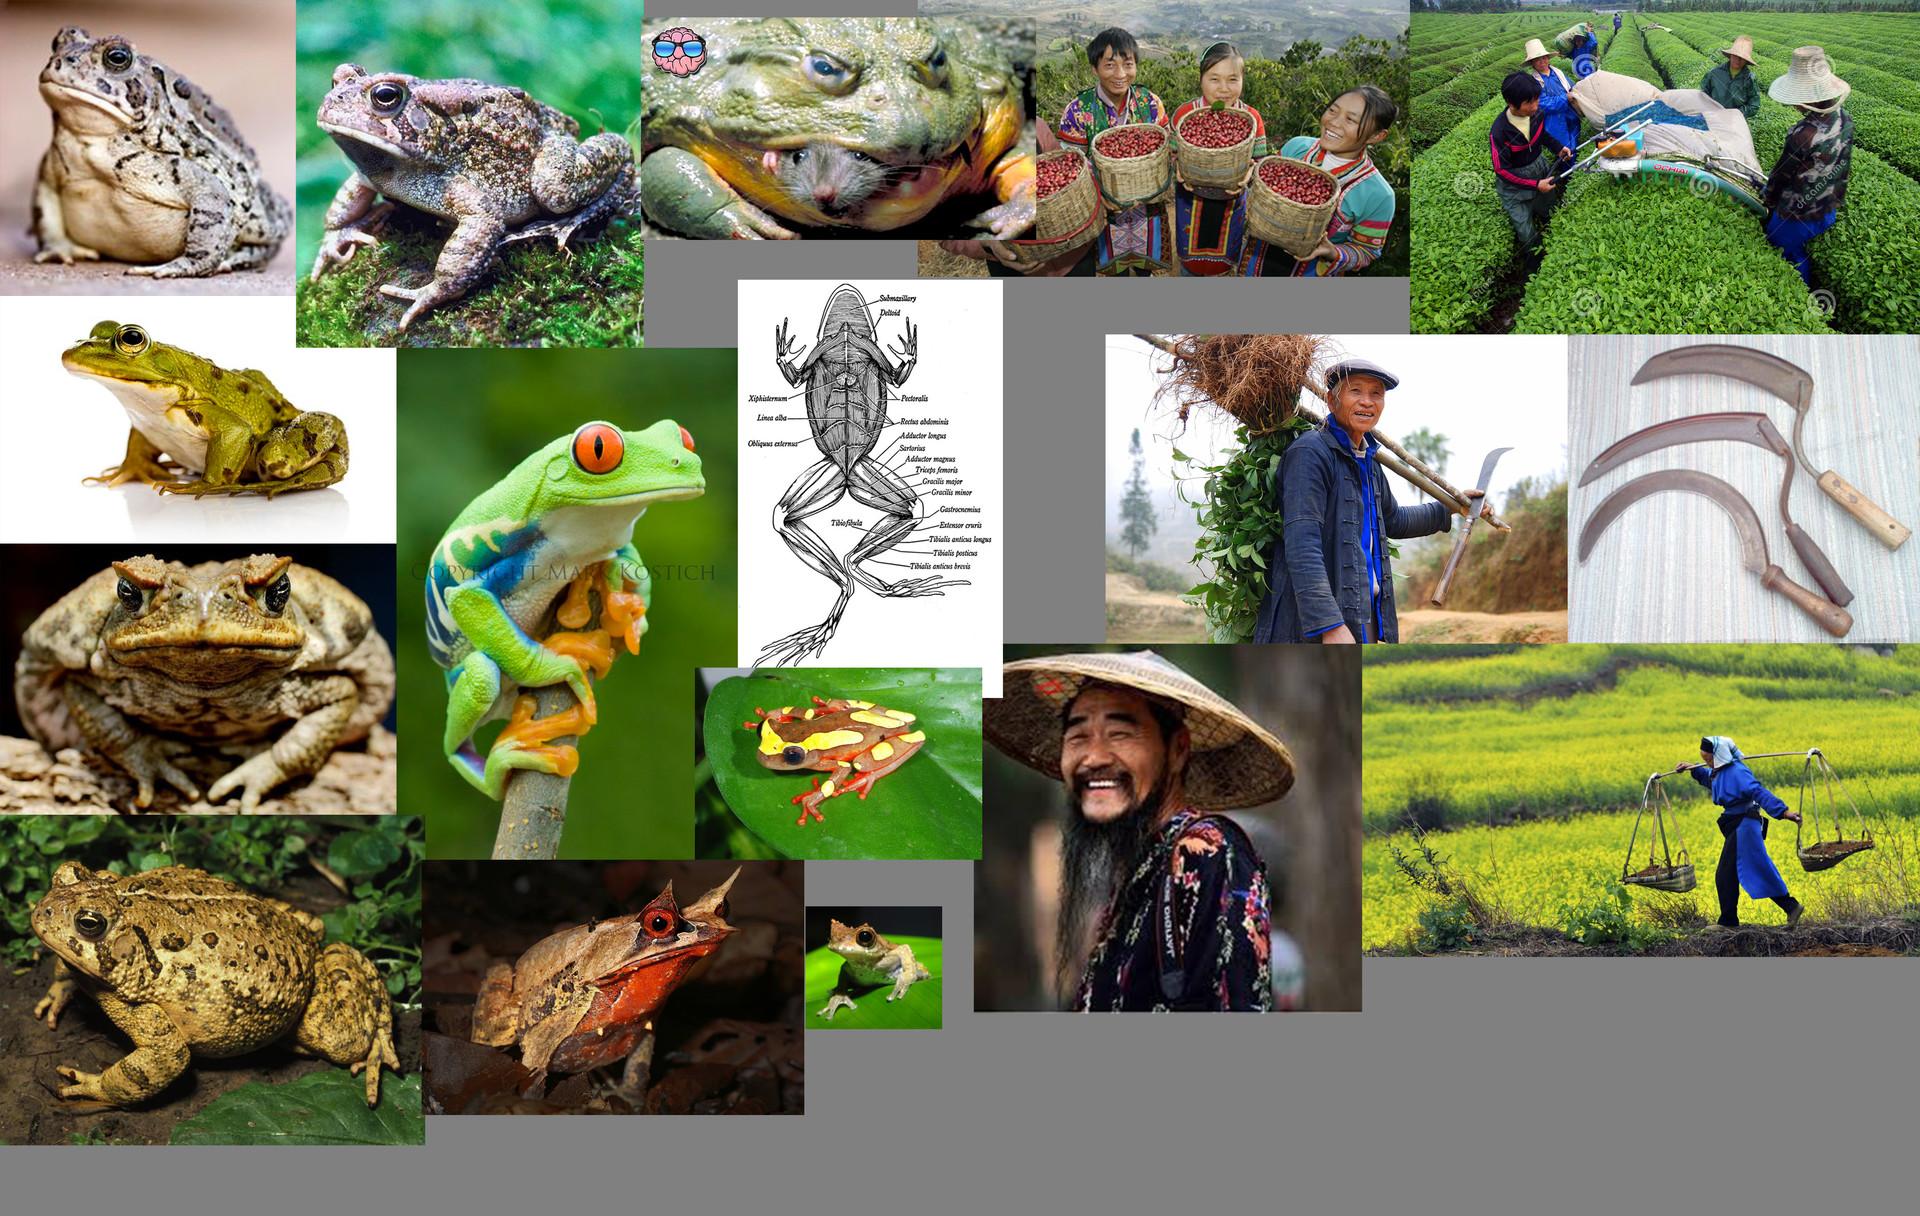 Pedro kruger garcia farmer frogs refs